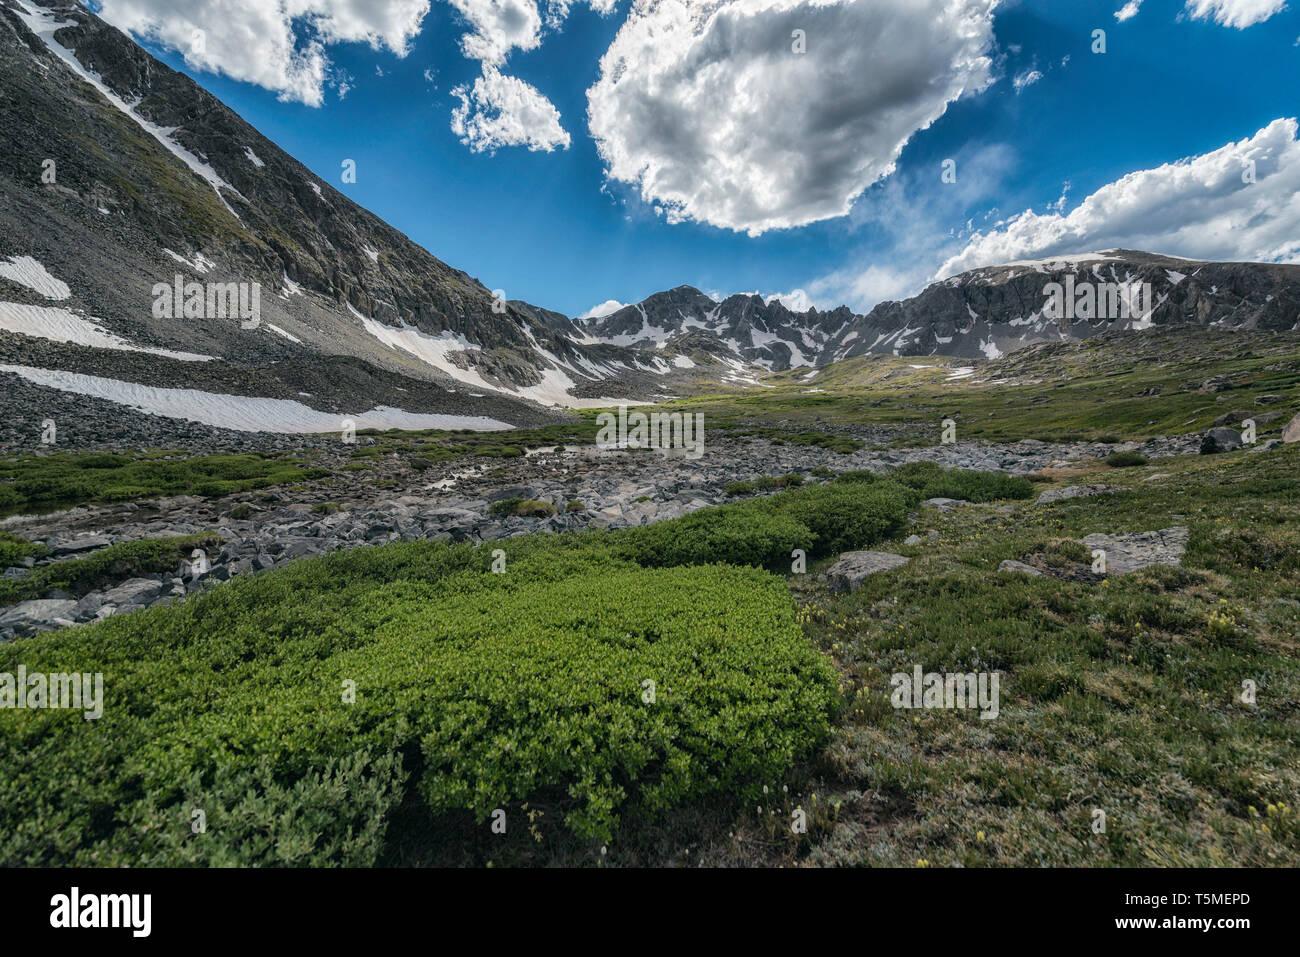 Landscape in Colorado - Stock Image